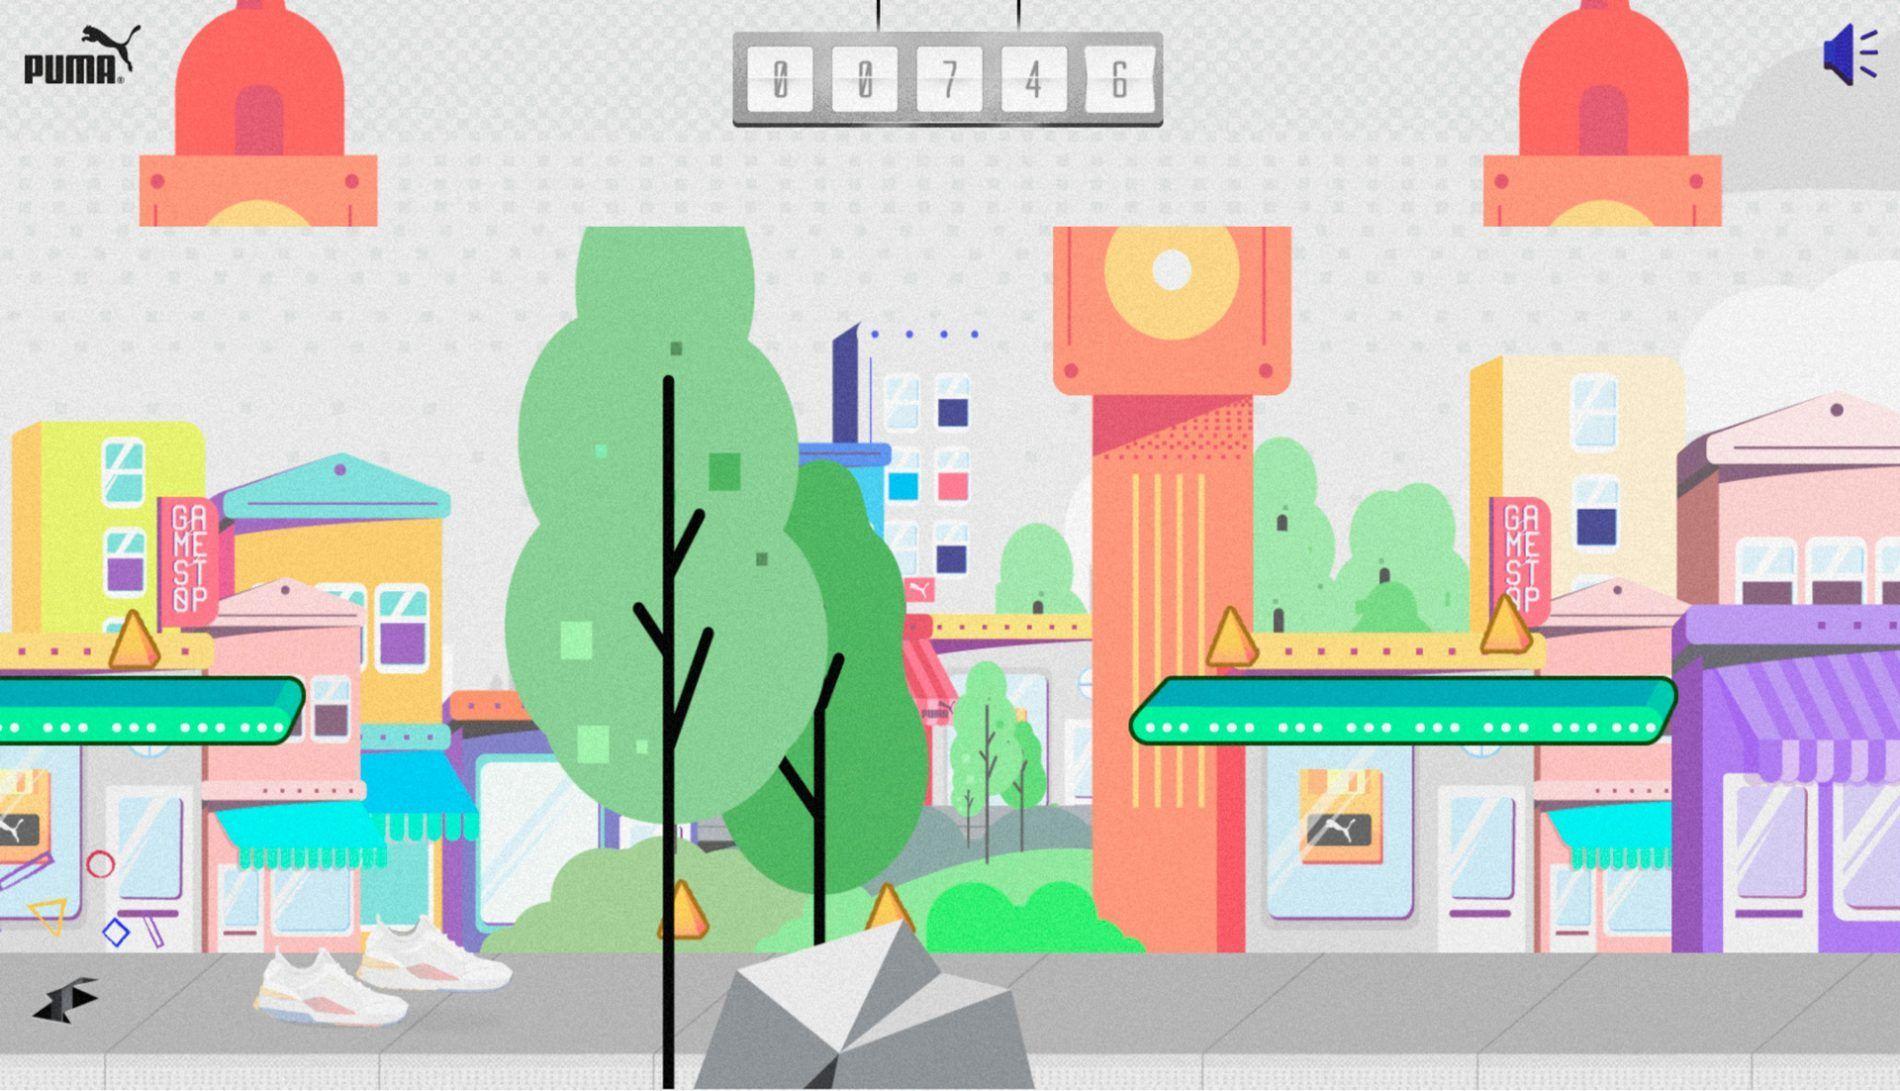 RS0 videojuego puma retro